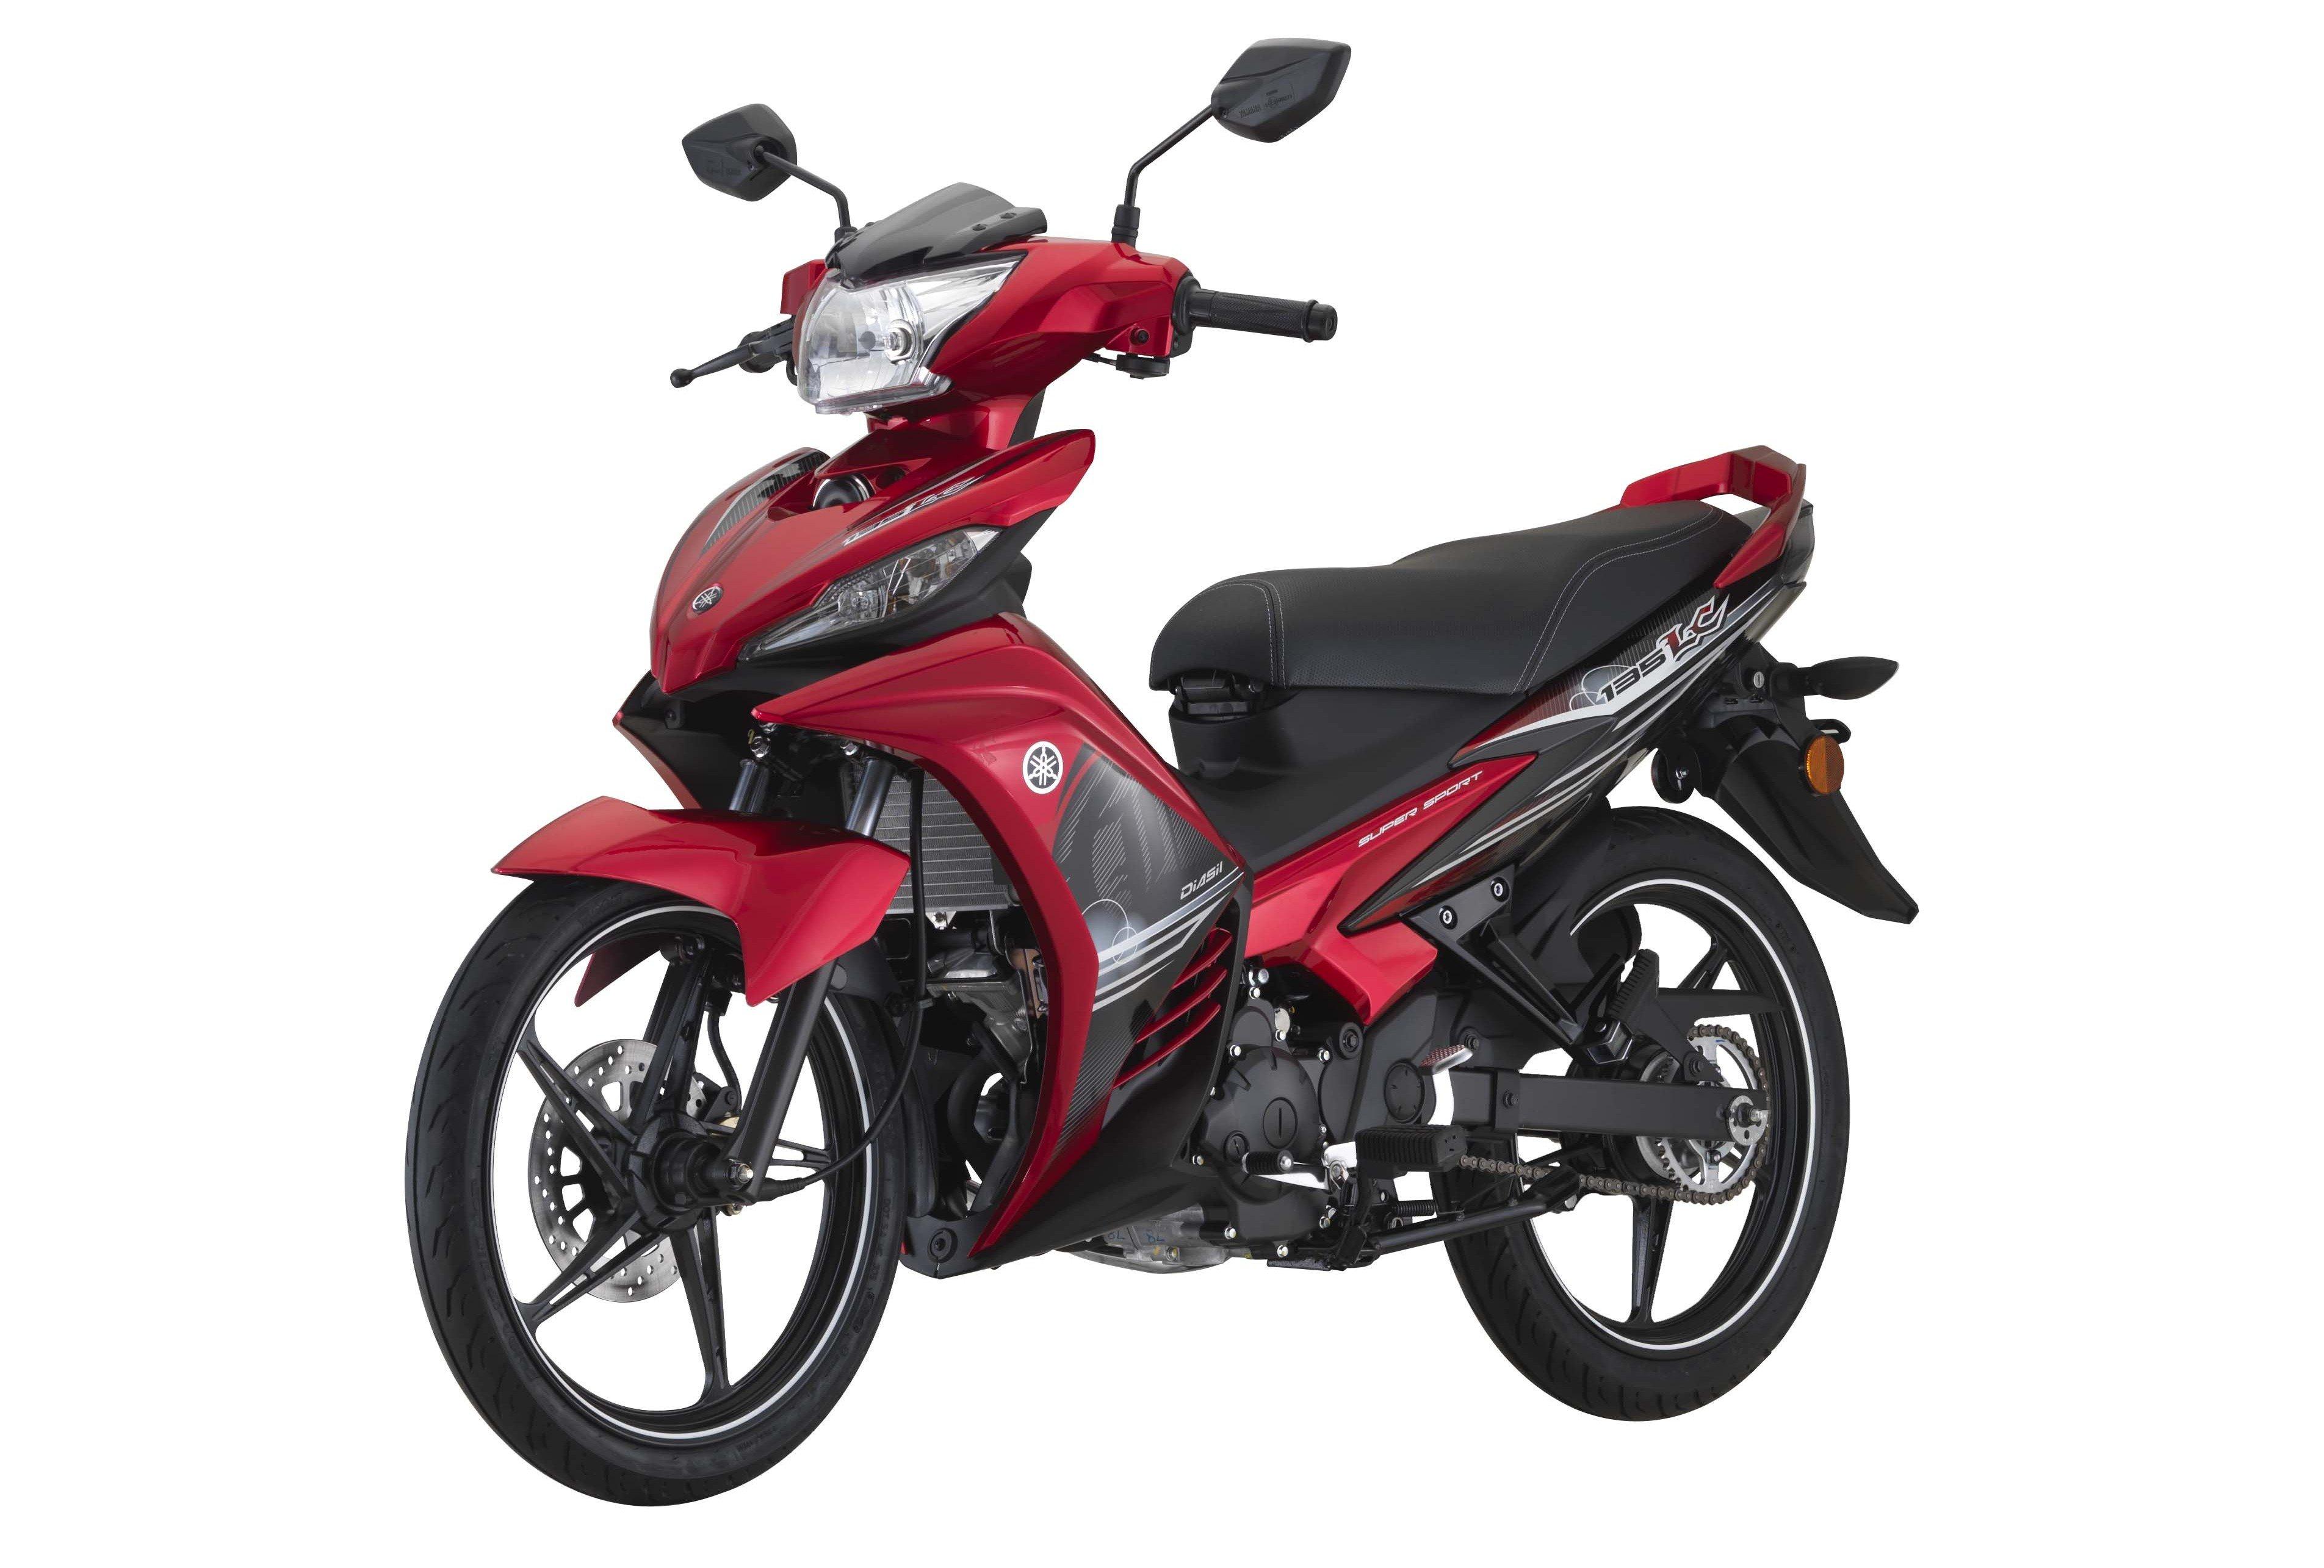 Harga Yamaha Lc  Baru